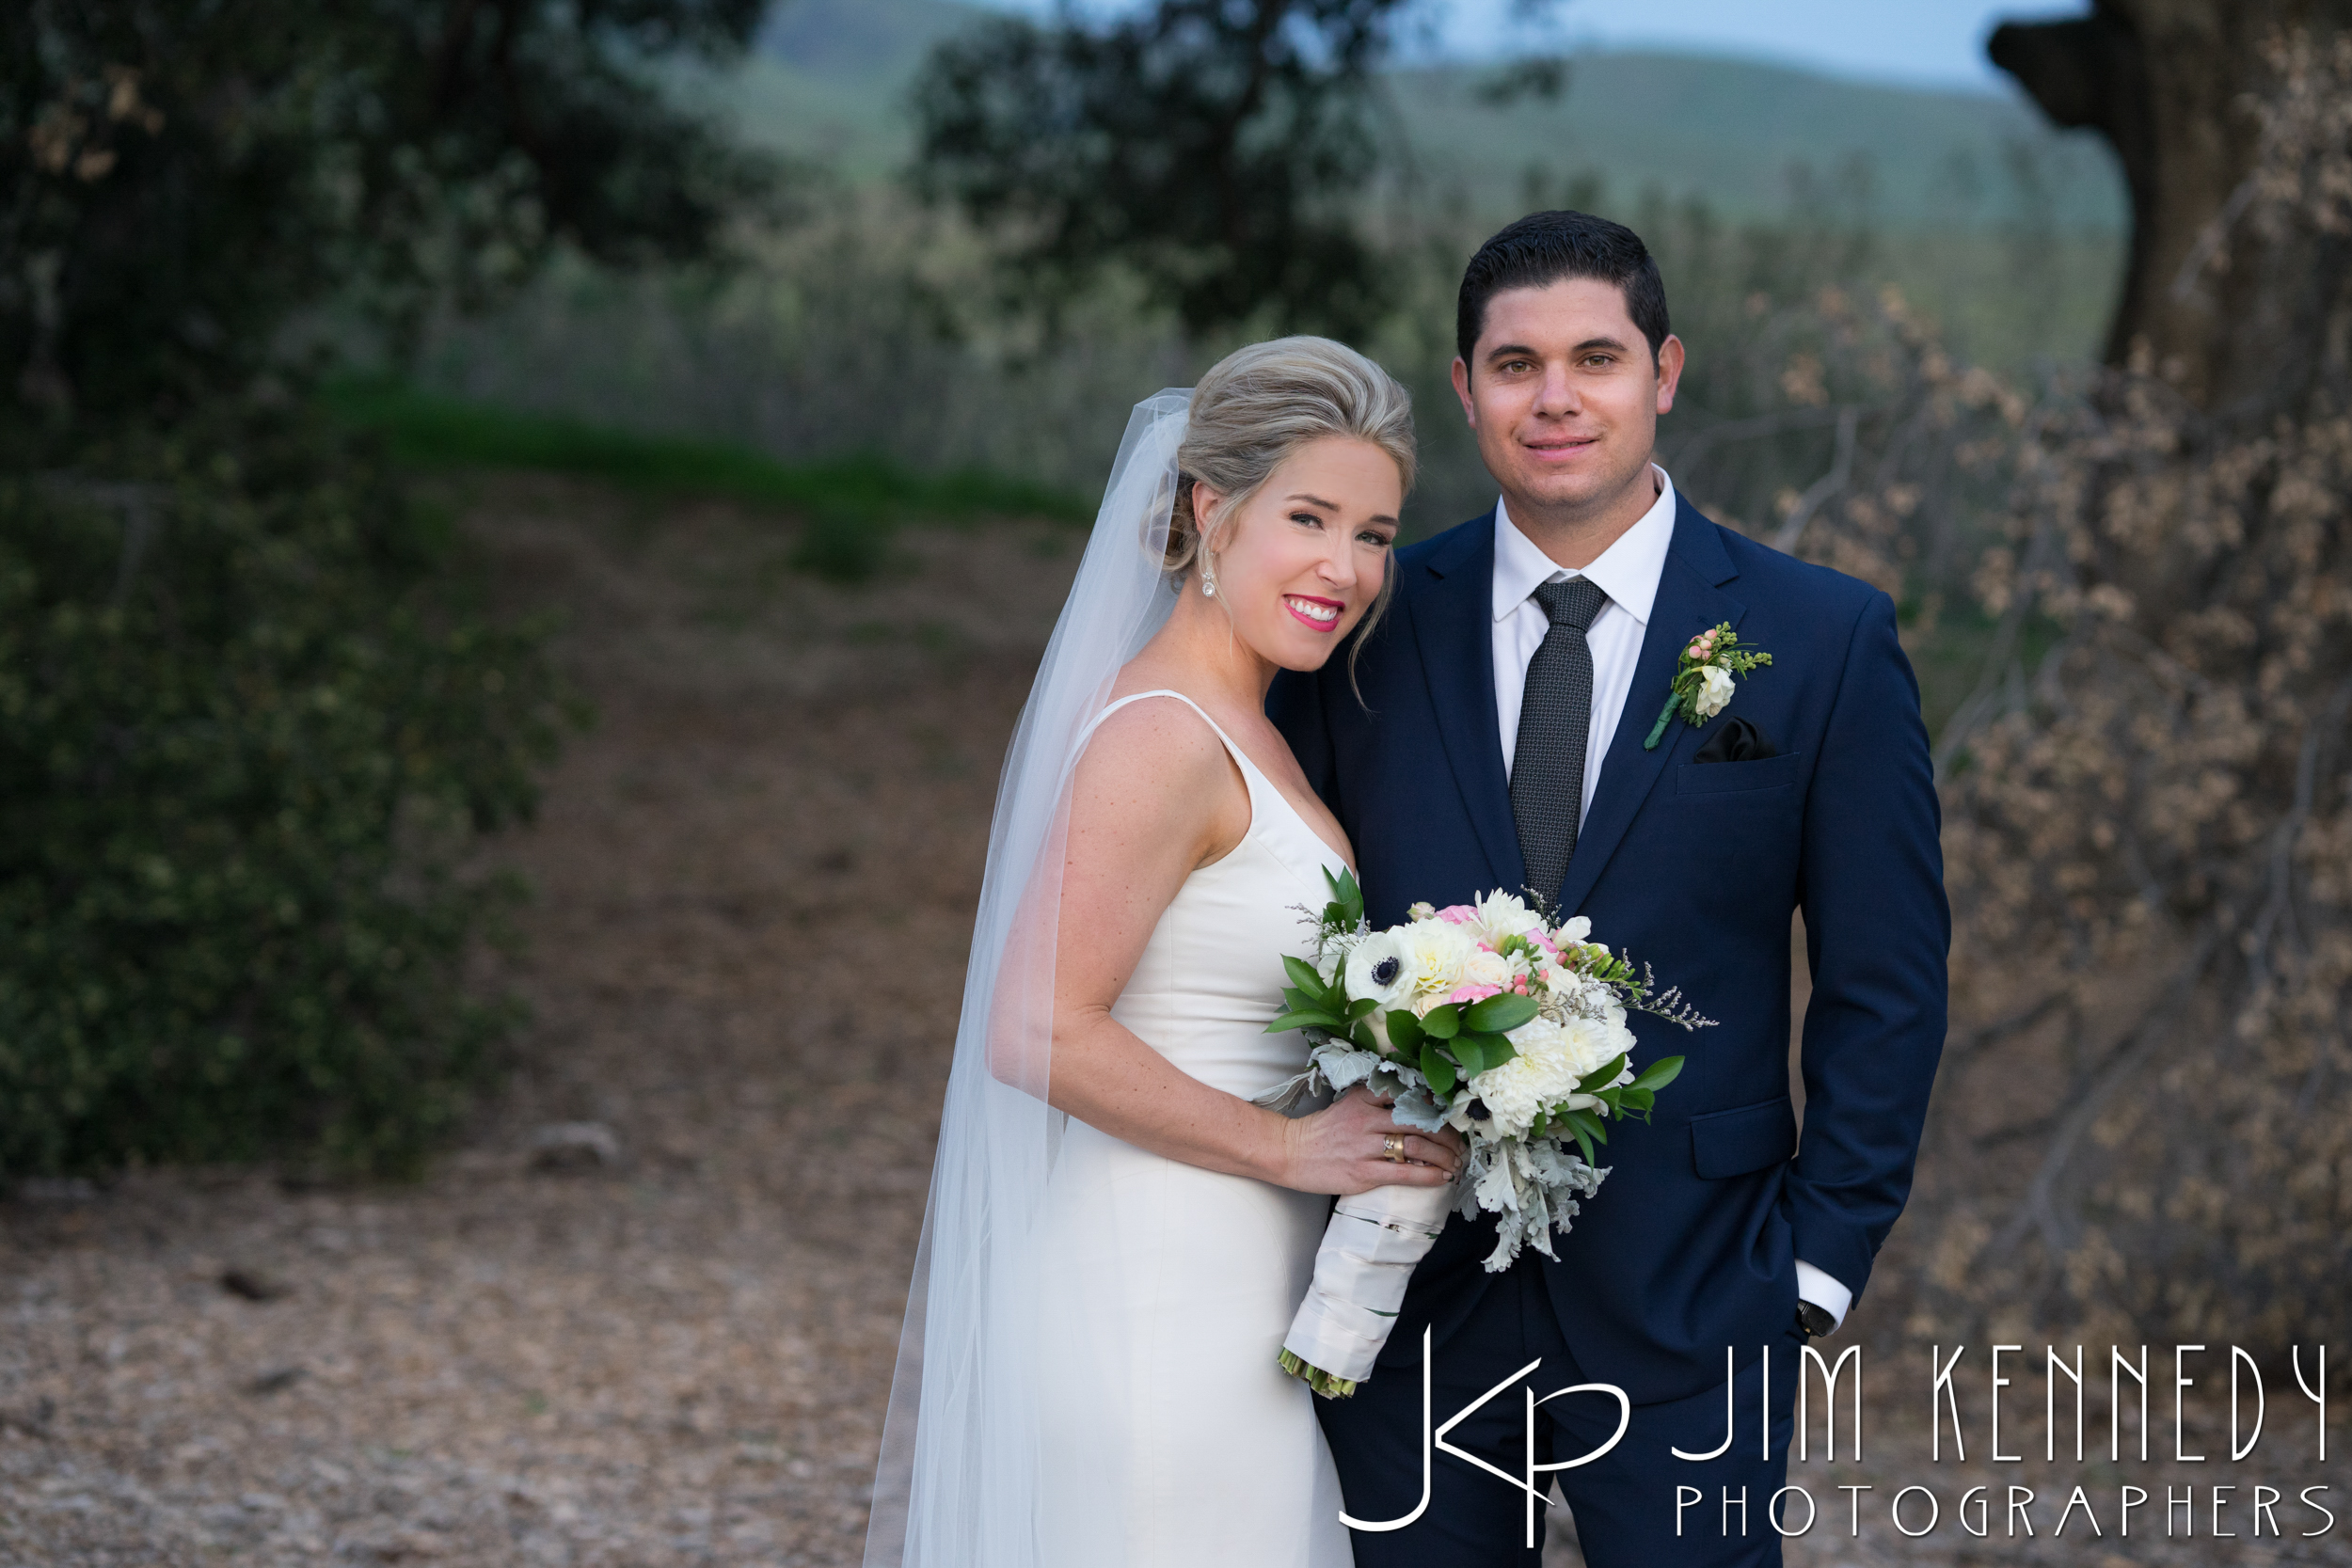 jim_kennedy_photographers_highland_springs_wedding_caitlyn_0152.jpg